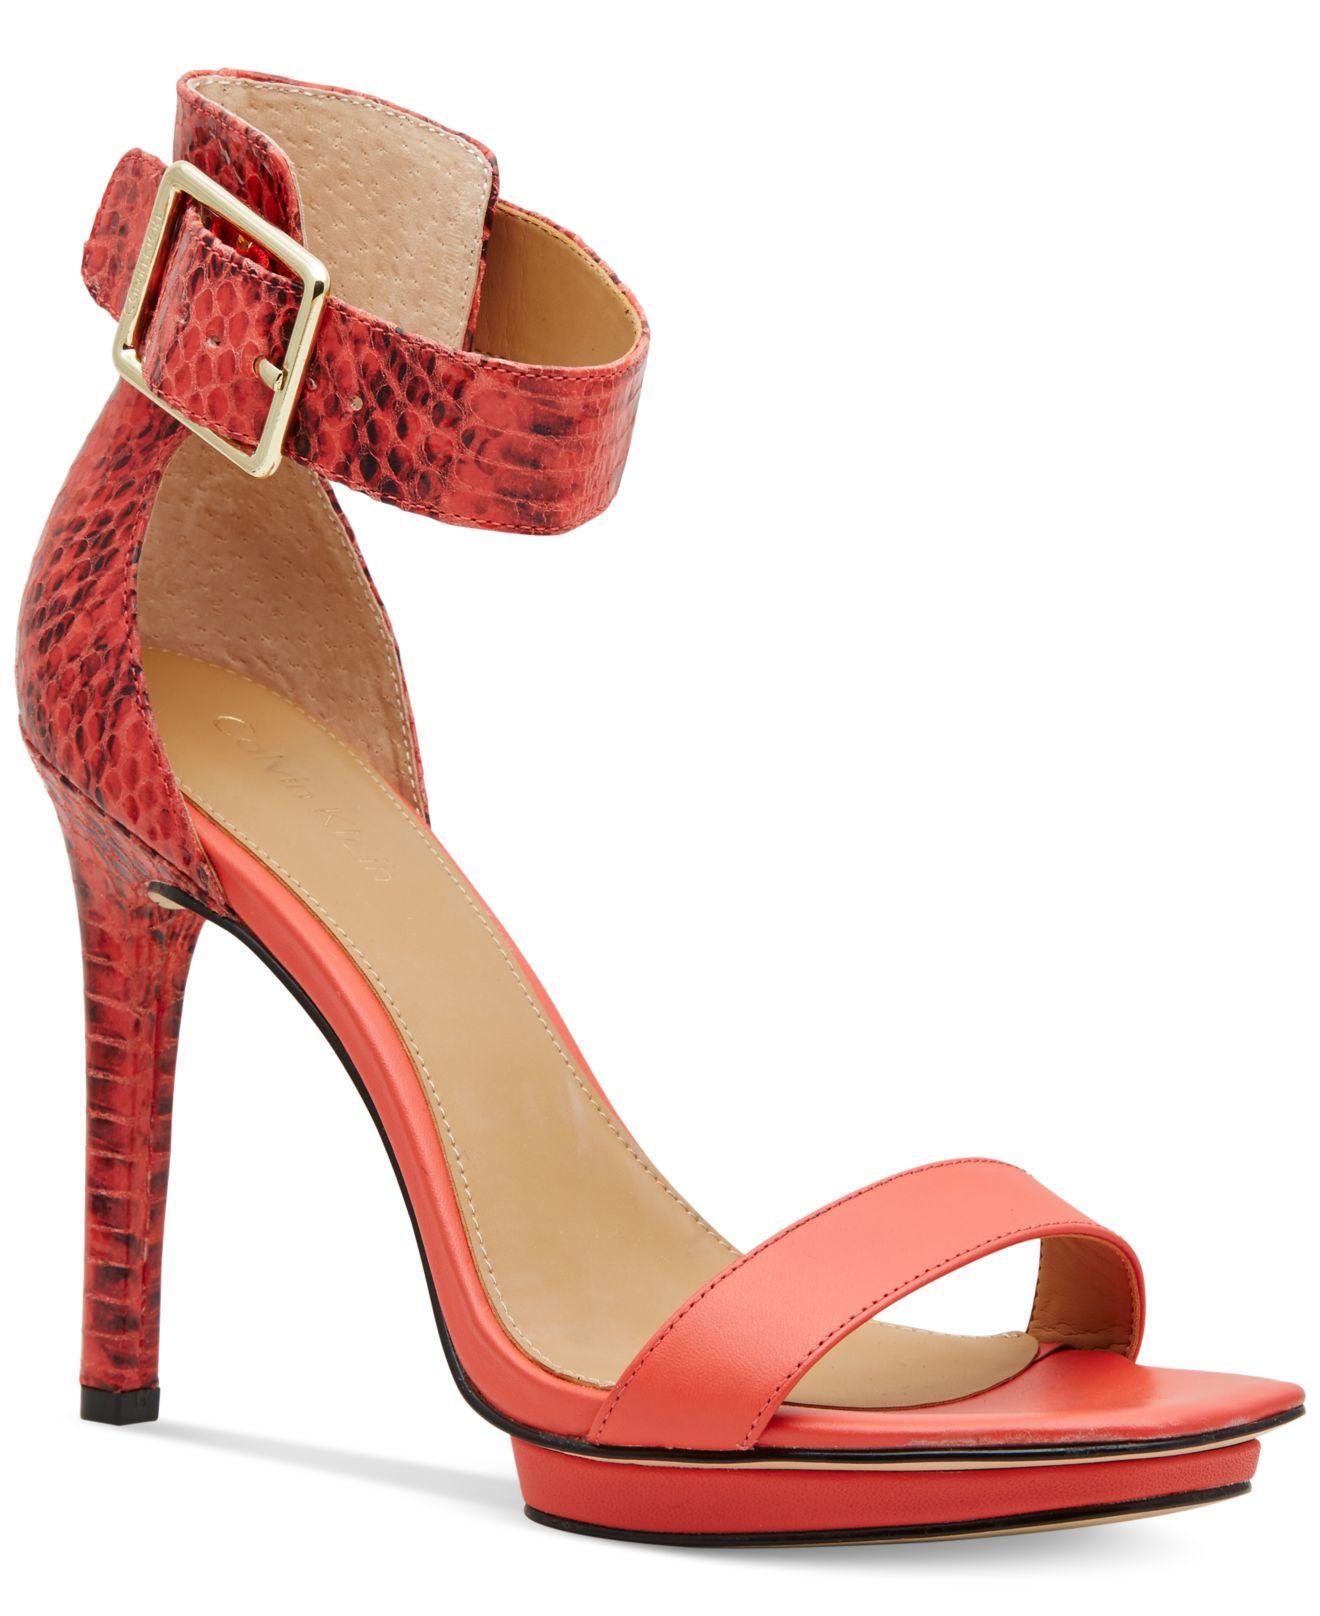 47d07750237 Lyst - Calvin Klein Women s Vable Sandals in Orange